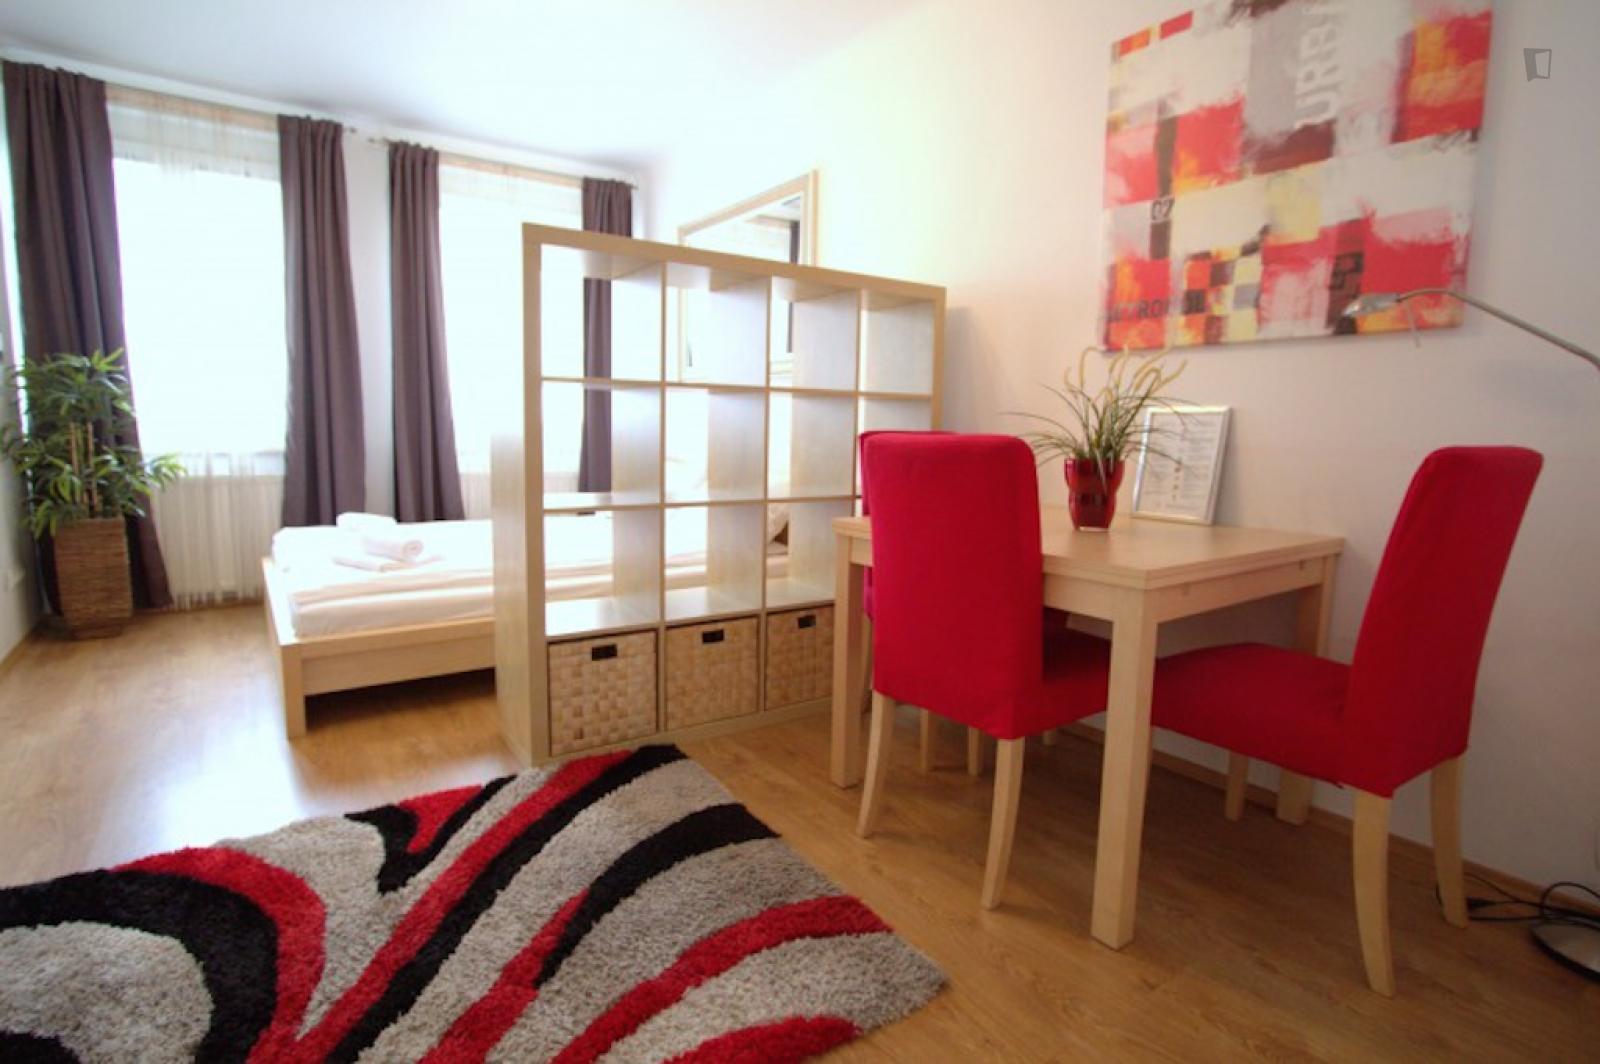 Wilhelmstrasse, Meidling, AT-9 - 1,350 EUR/ month